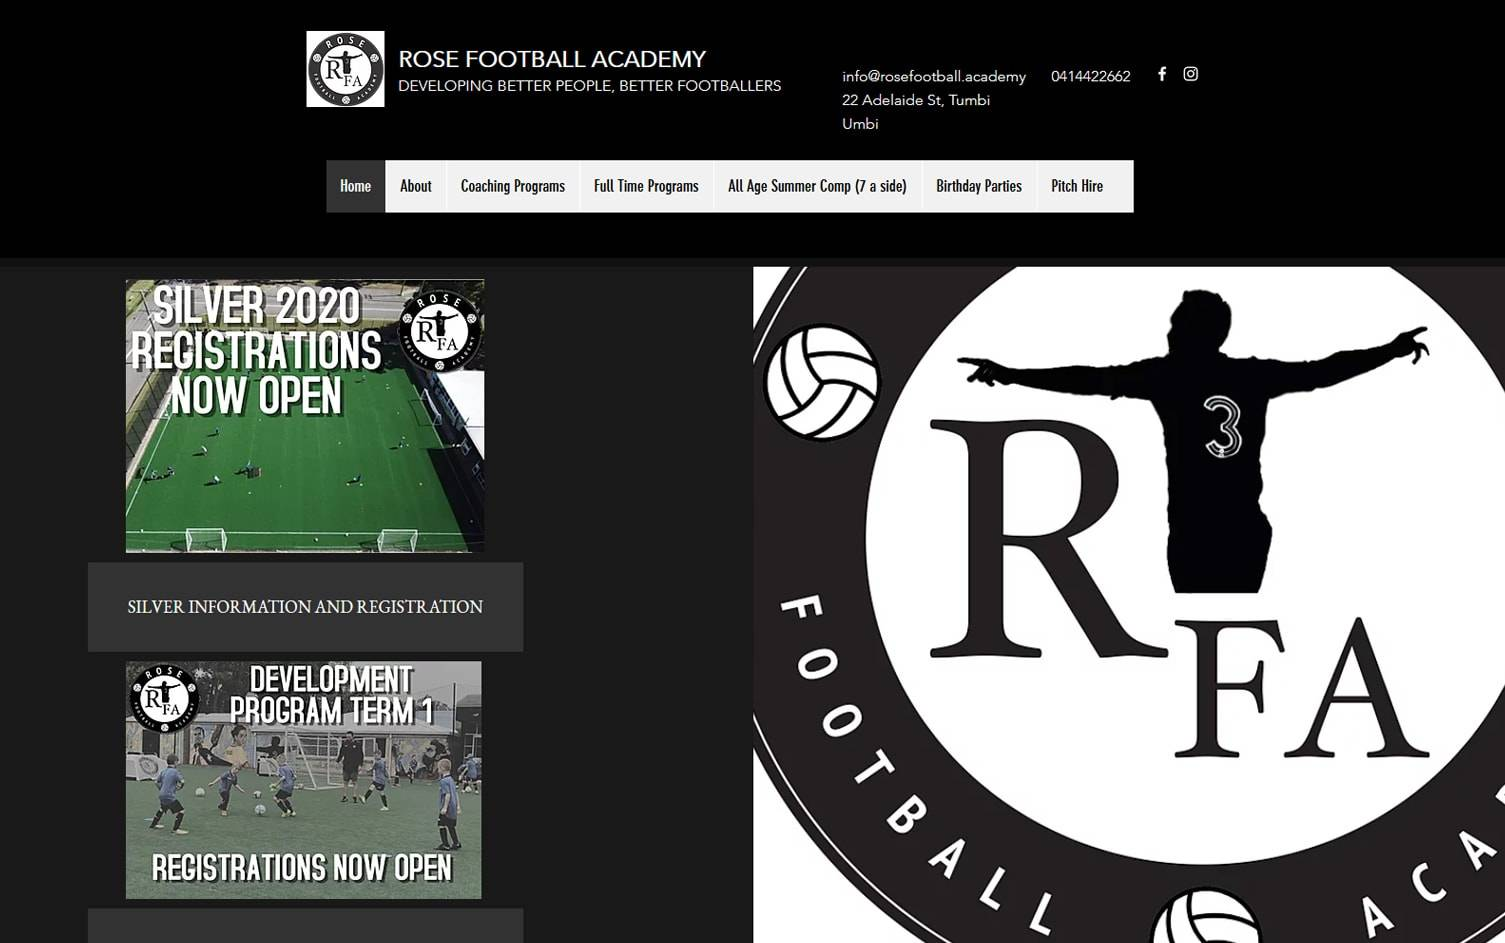 Rose Football Academy